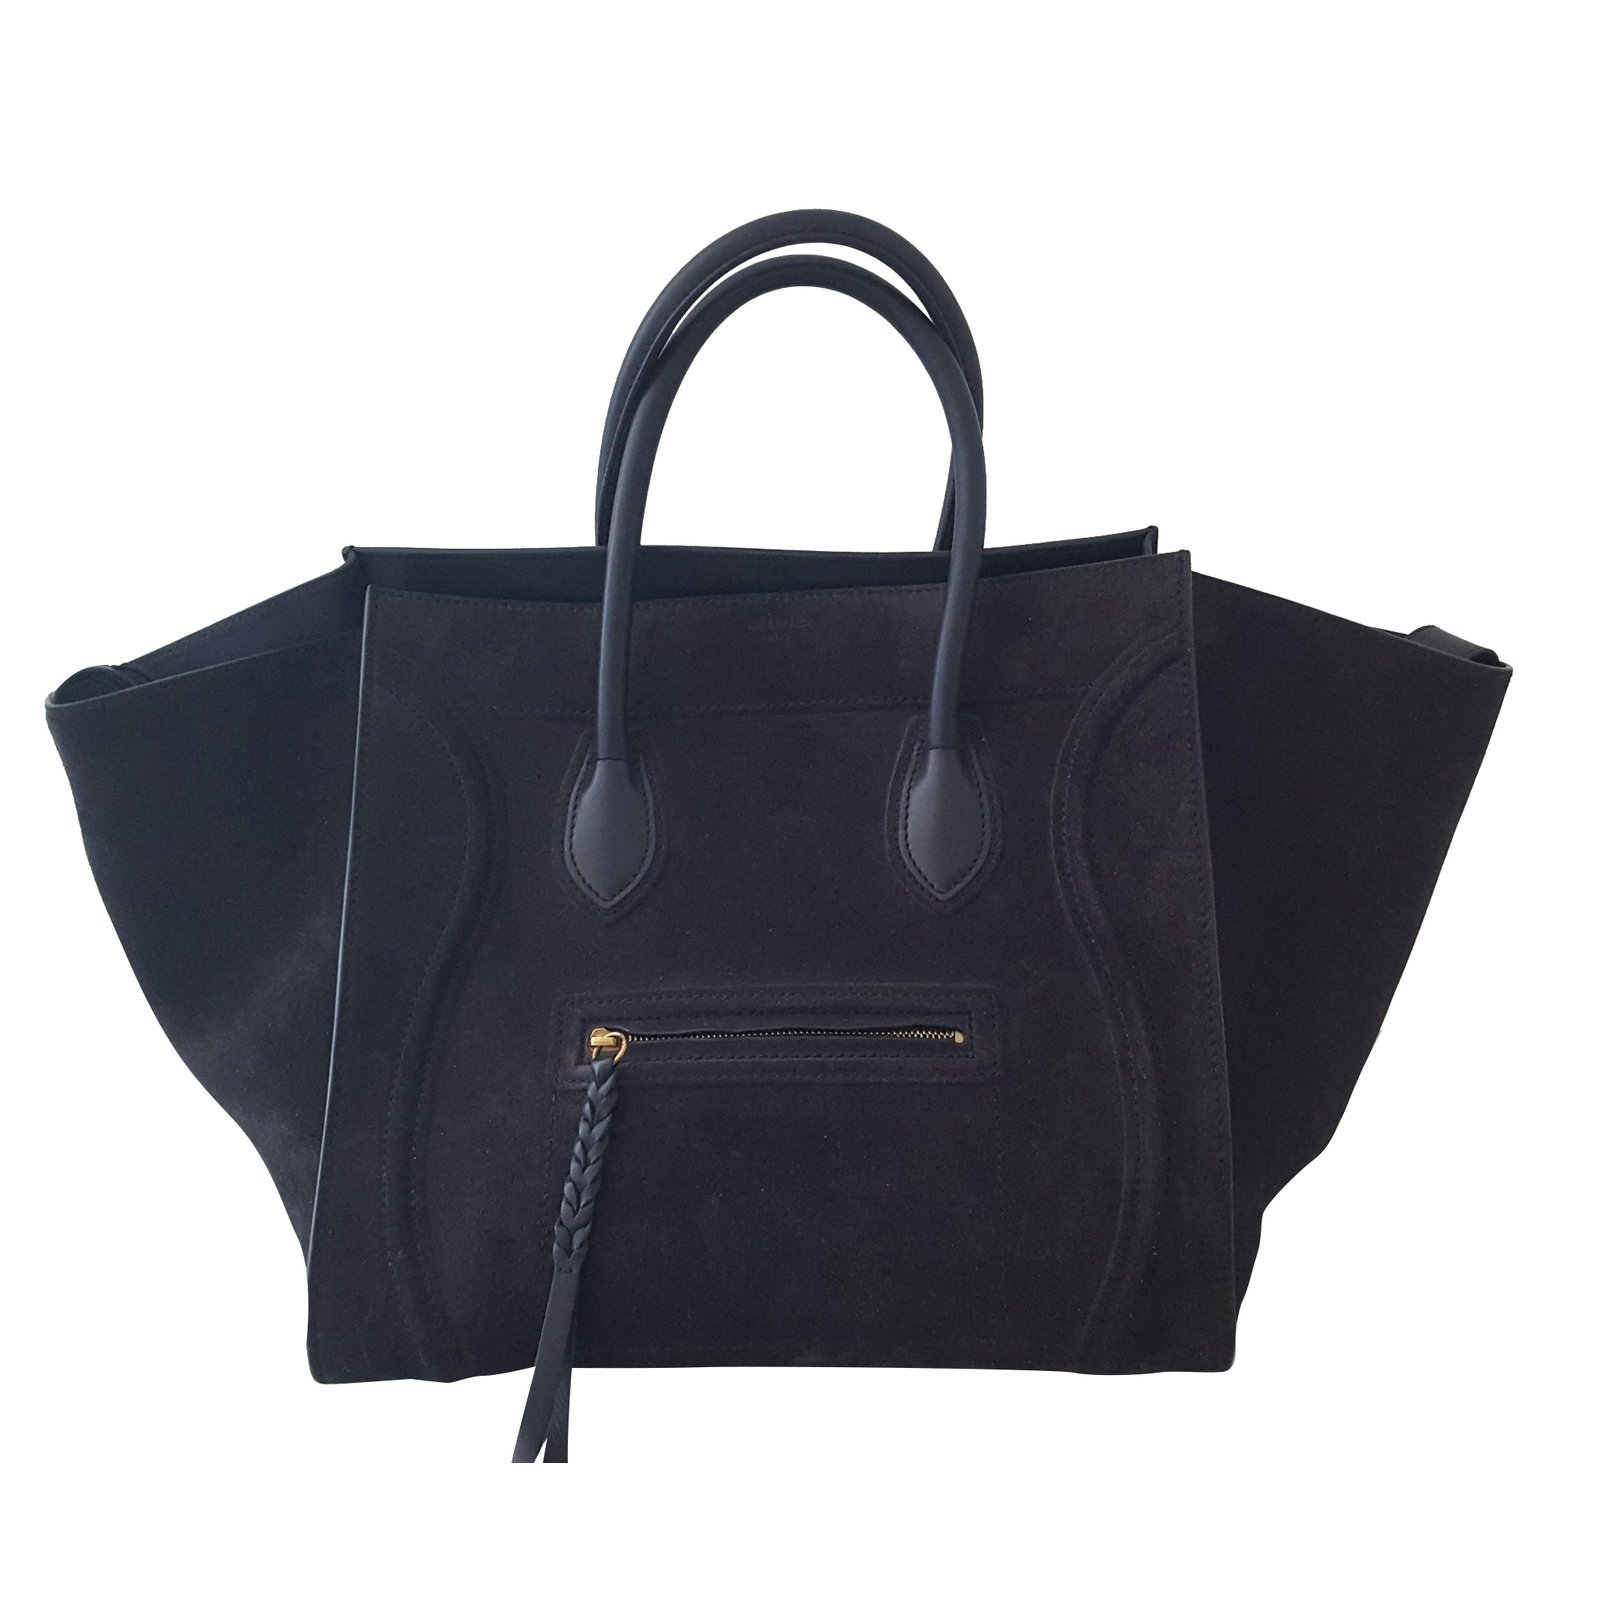 e84adf9805 Céline Céline phantom Luggage Handbags Leather Dark grey ref.34104 ...